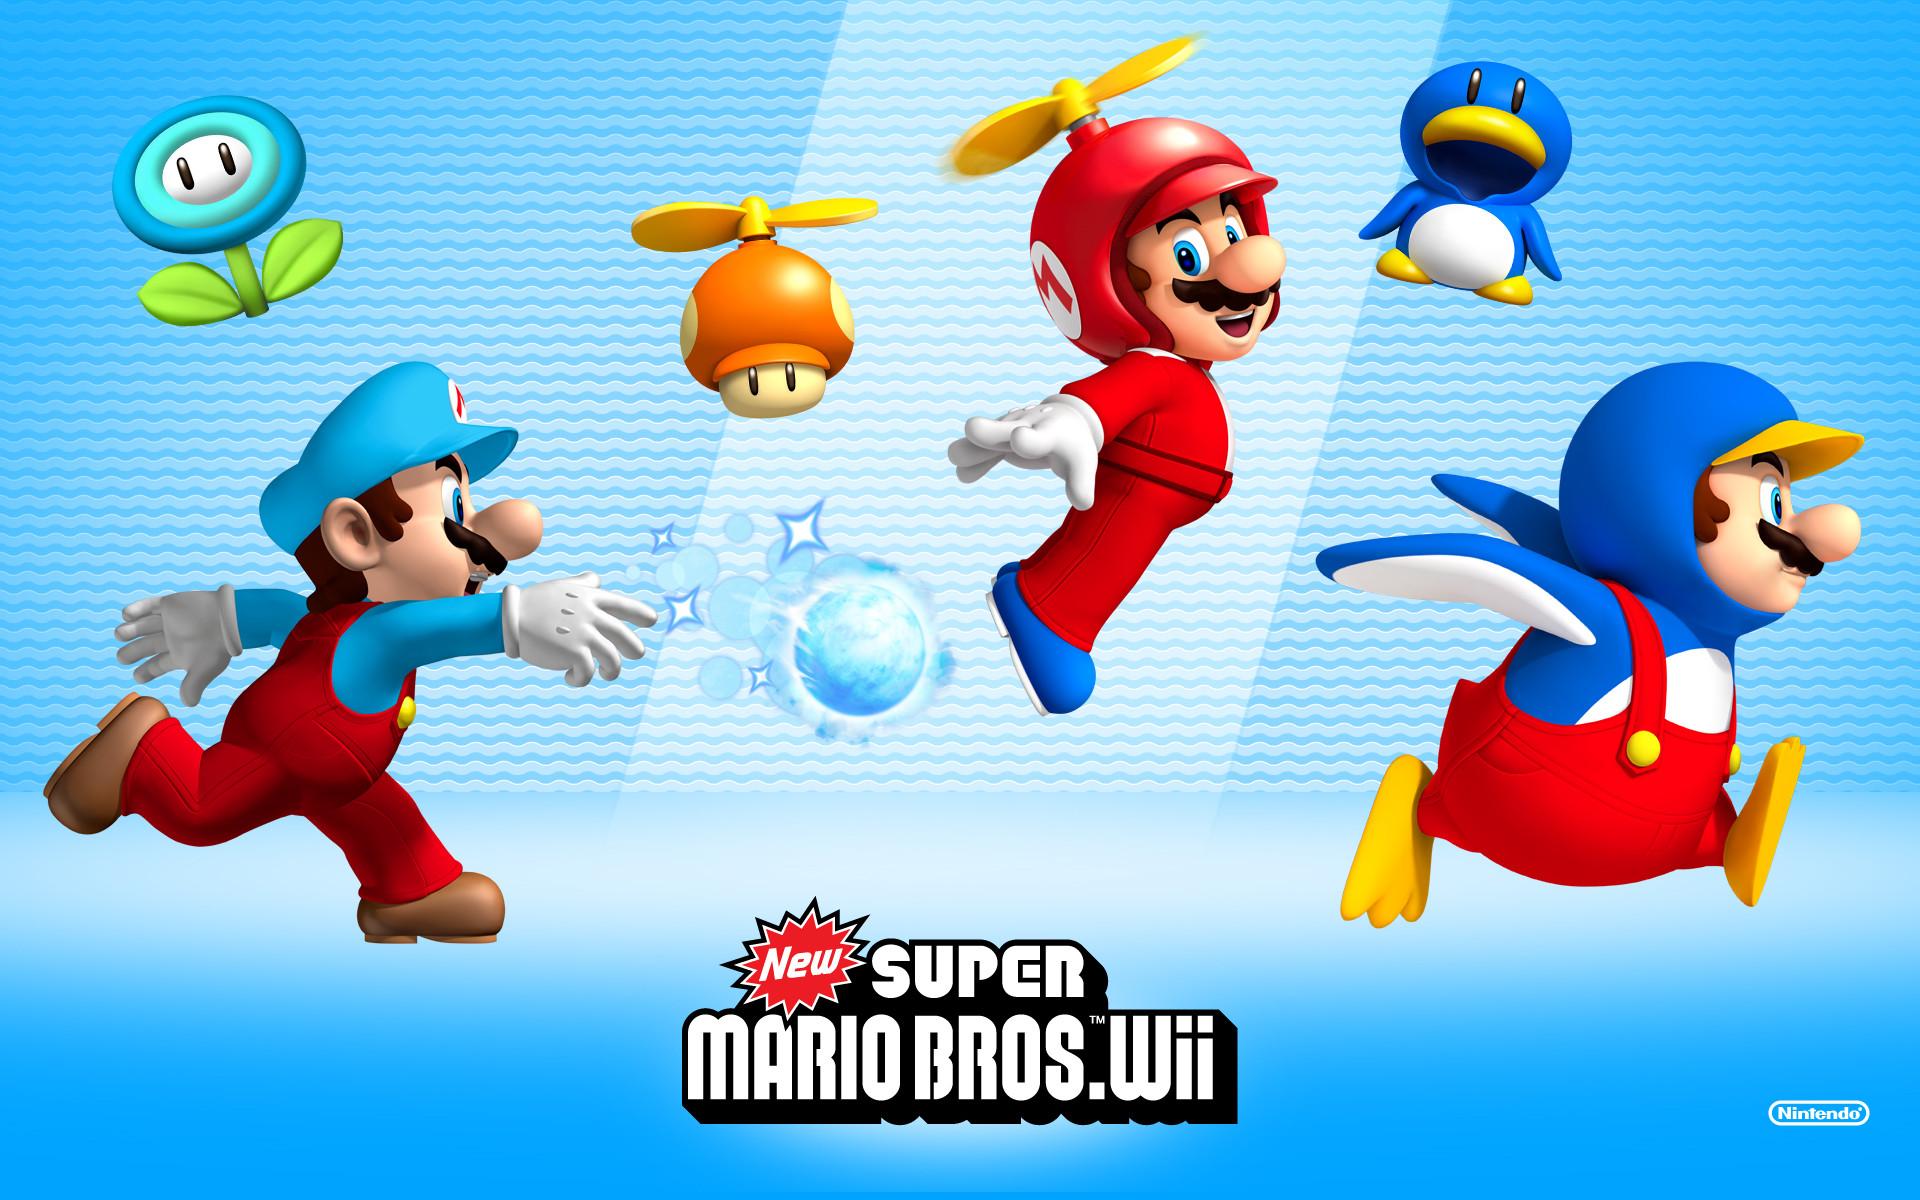 Video Games Wallpaper Set 2 (Nintendo)